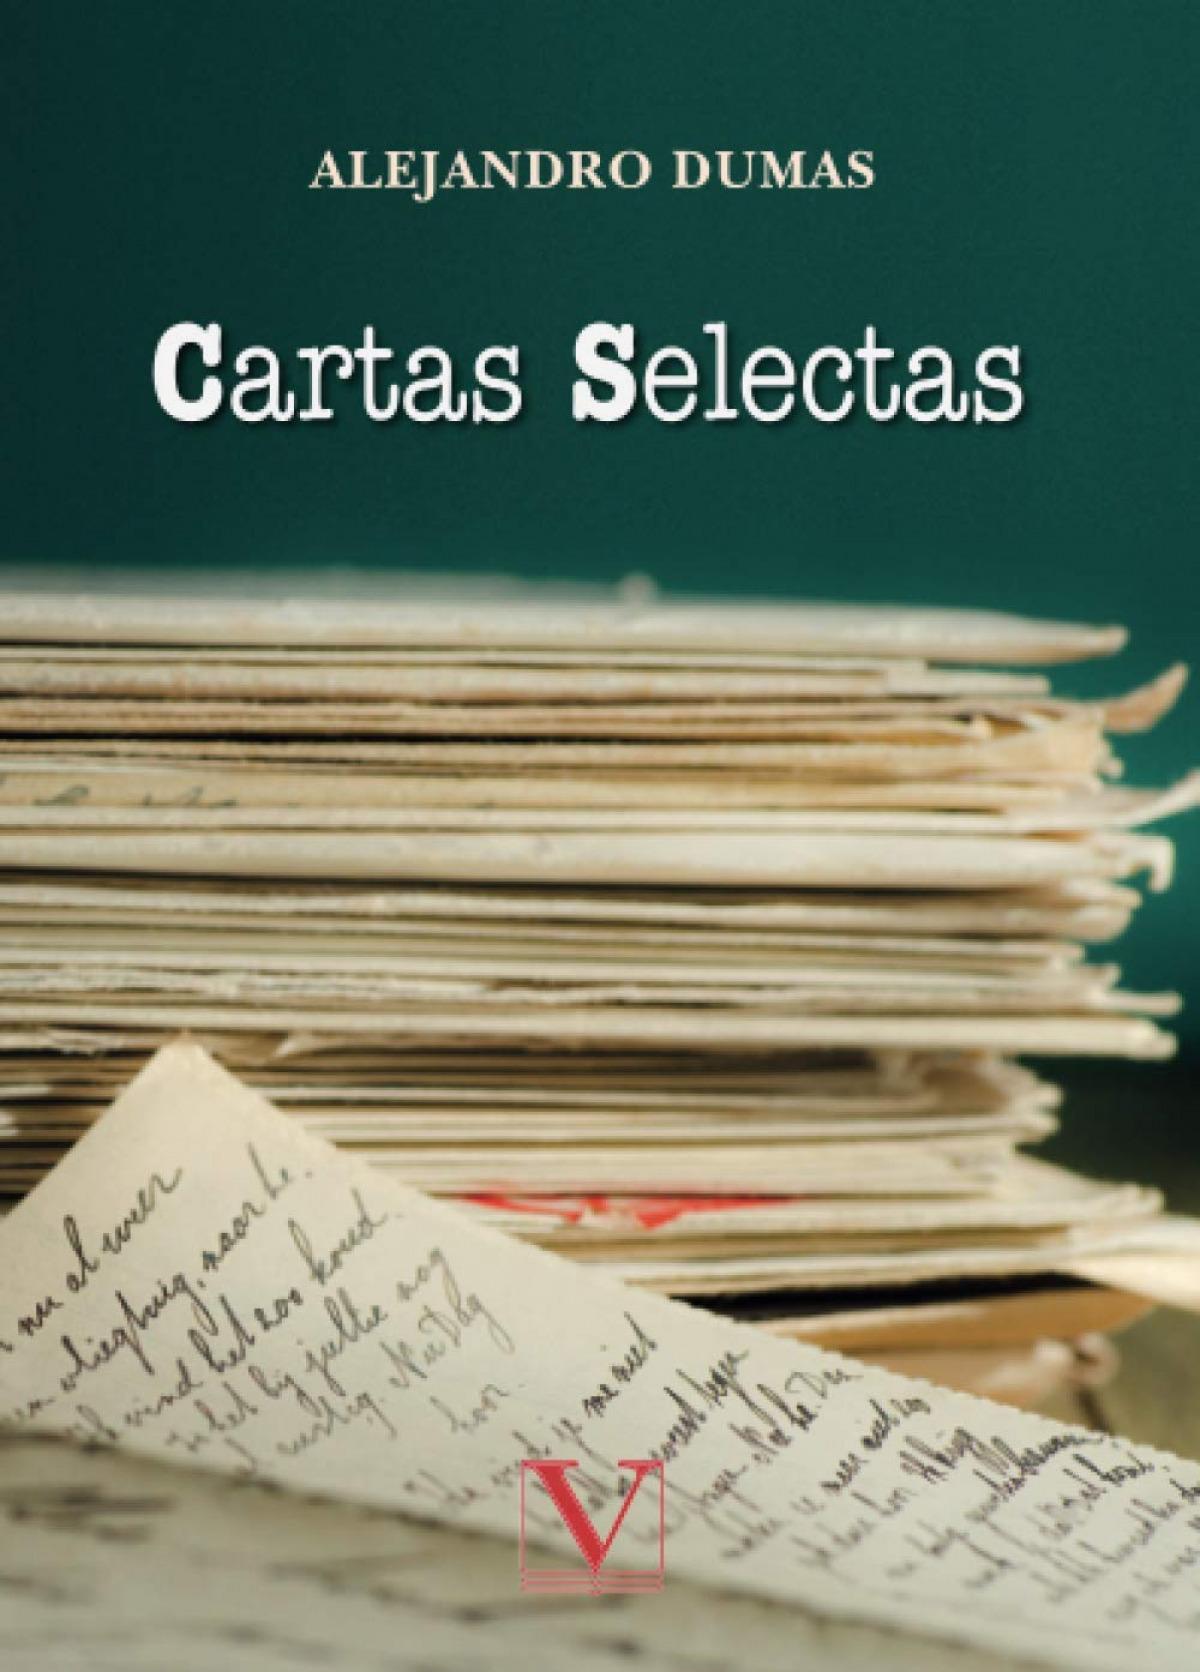 Cartas selectas